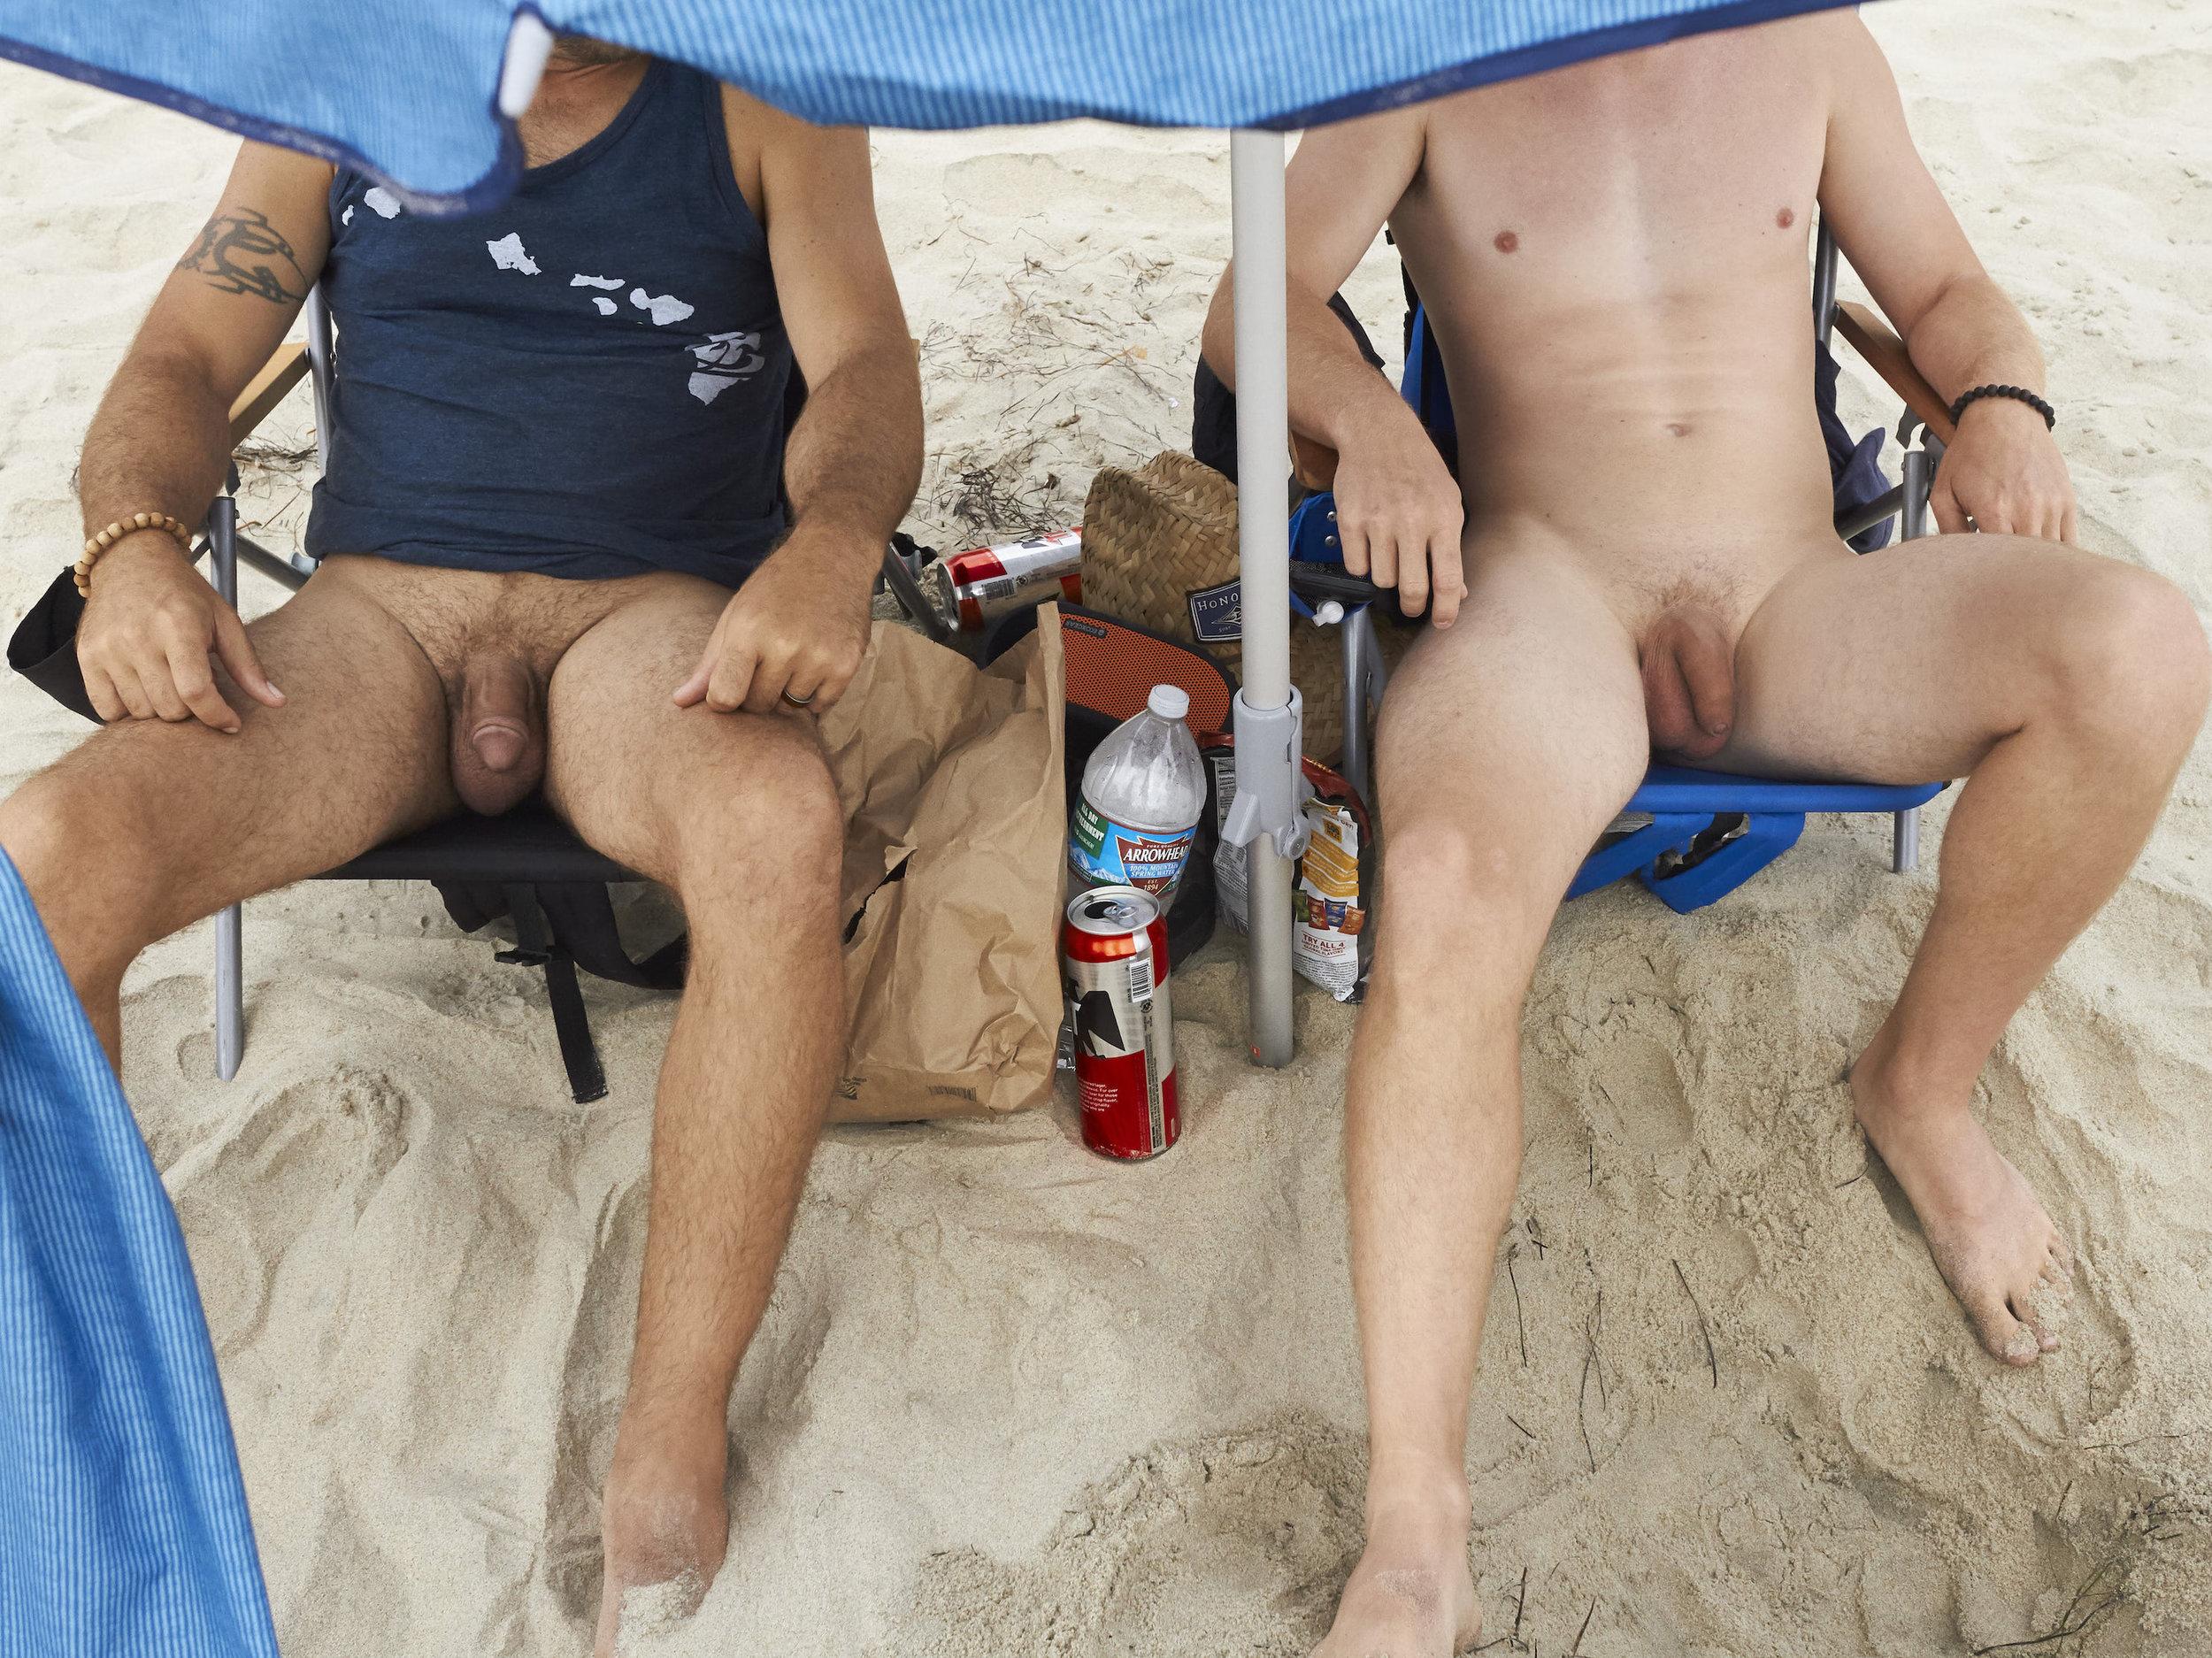 Men under Umbrellas